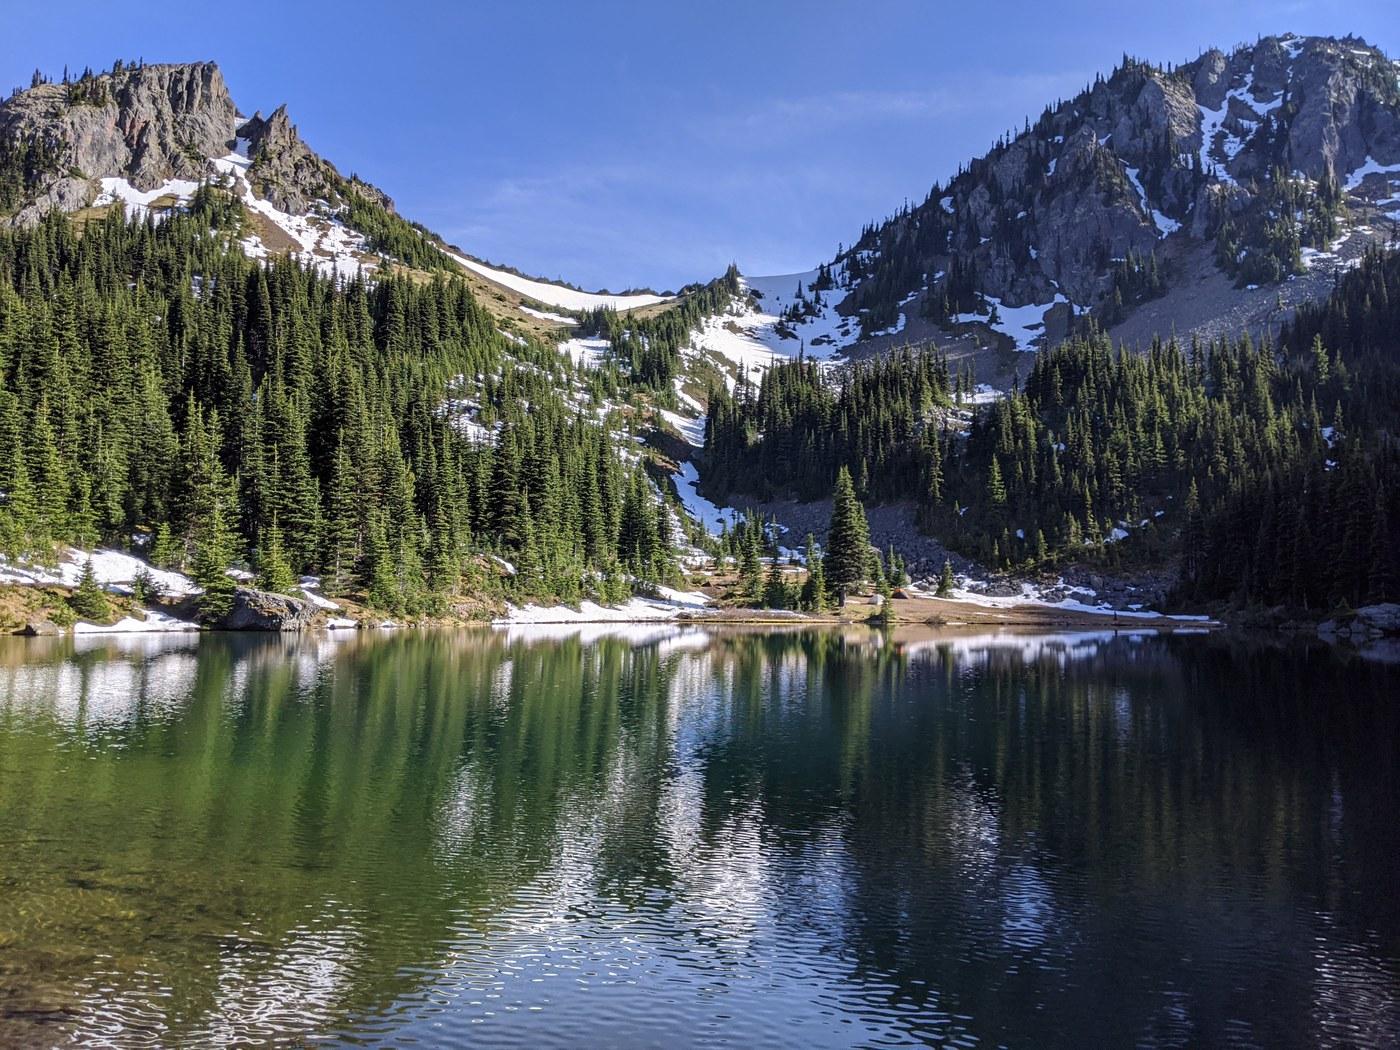 Silver Lakes. Photo by vikr.jpeg